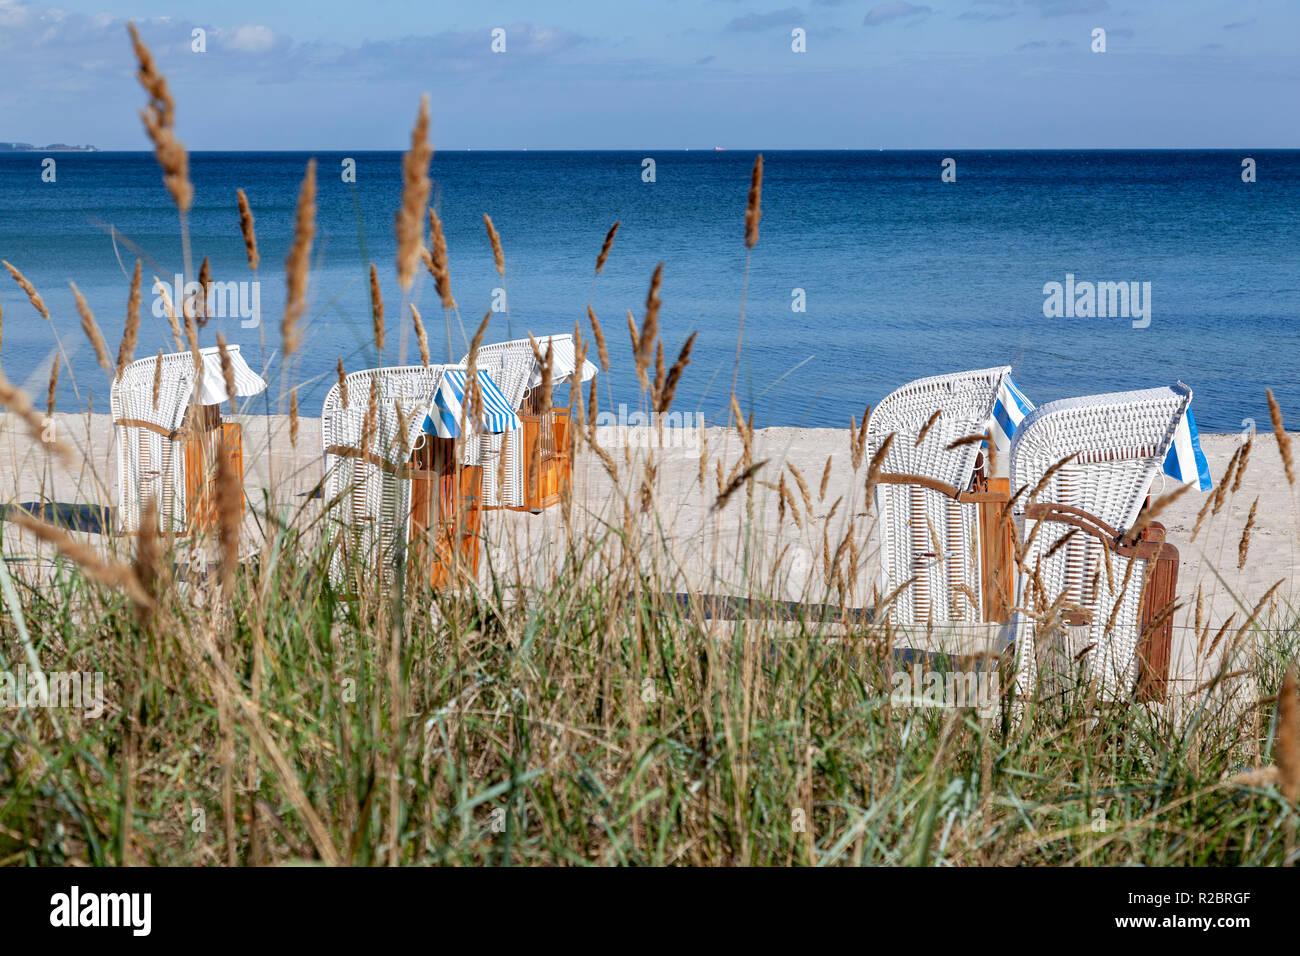 Strandkörbe an der Ostsee - Stock Image